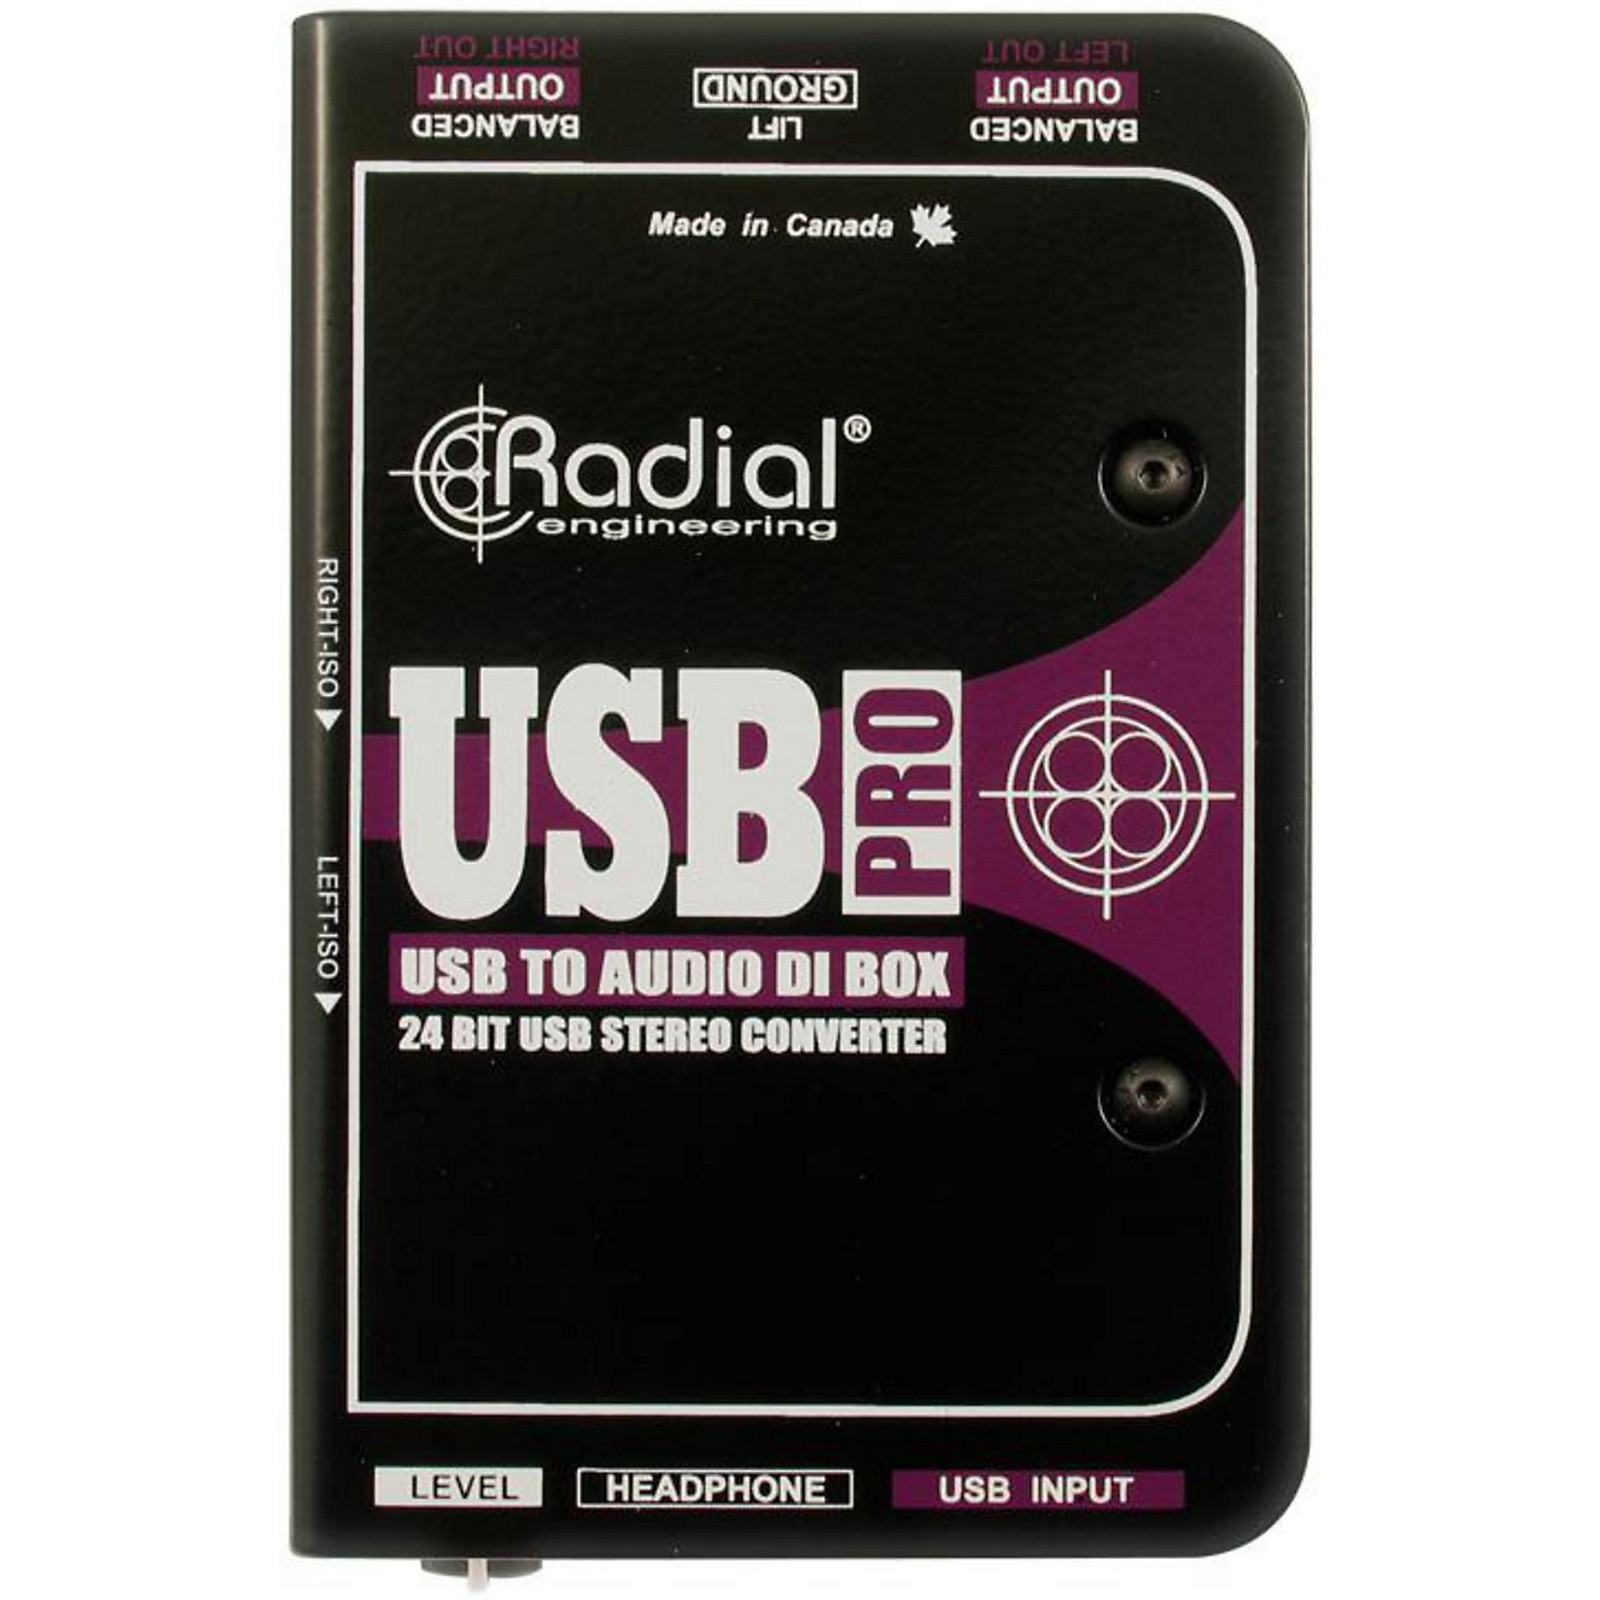 Radial Engineering USB-Pro Stereo USB Laptop DI